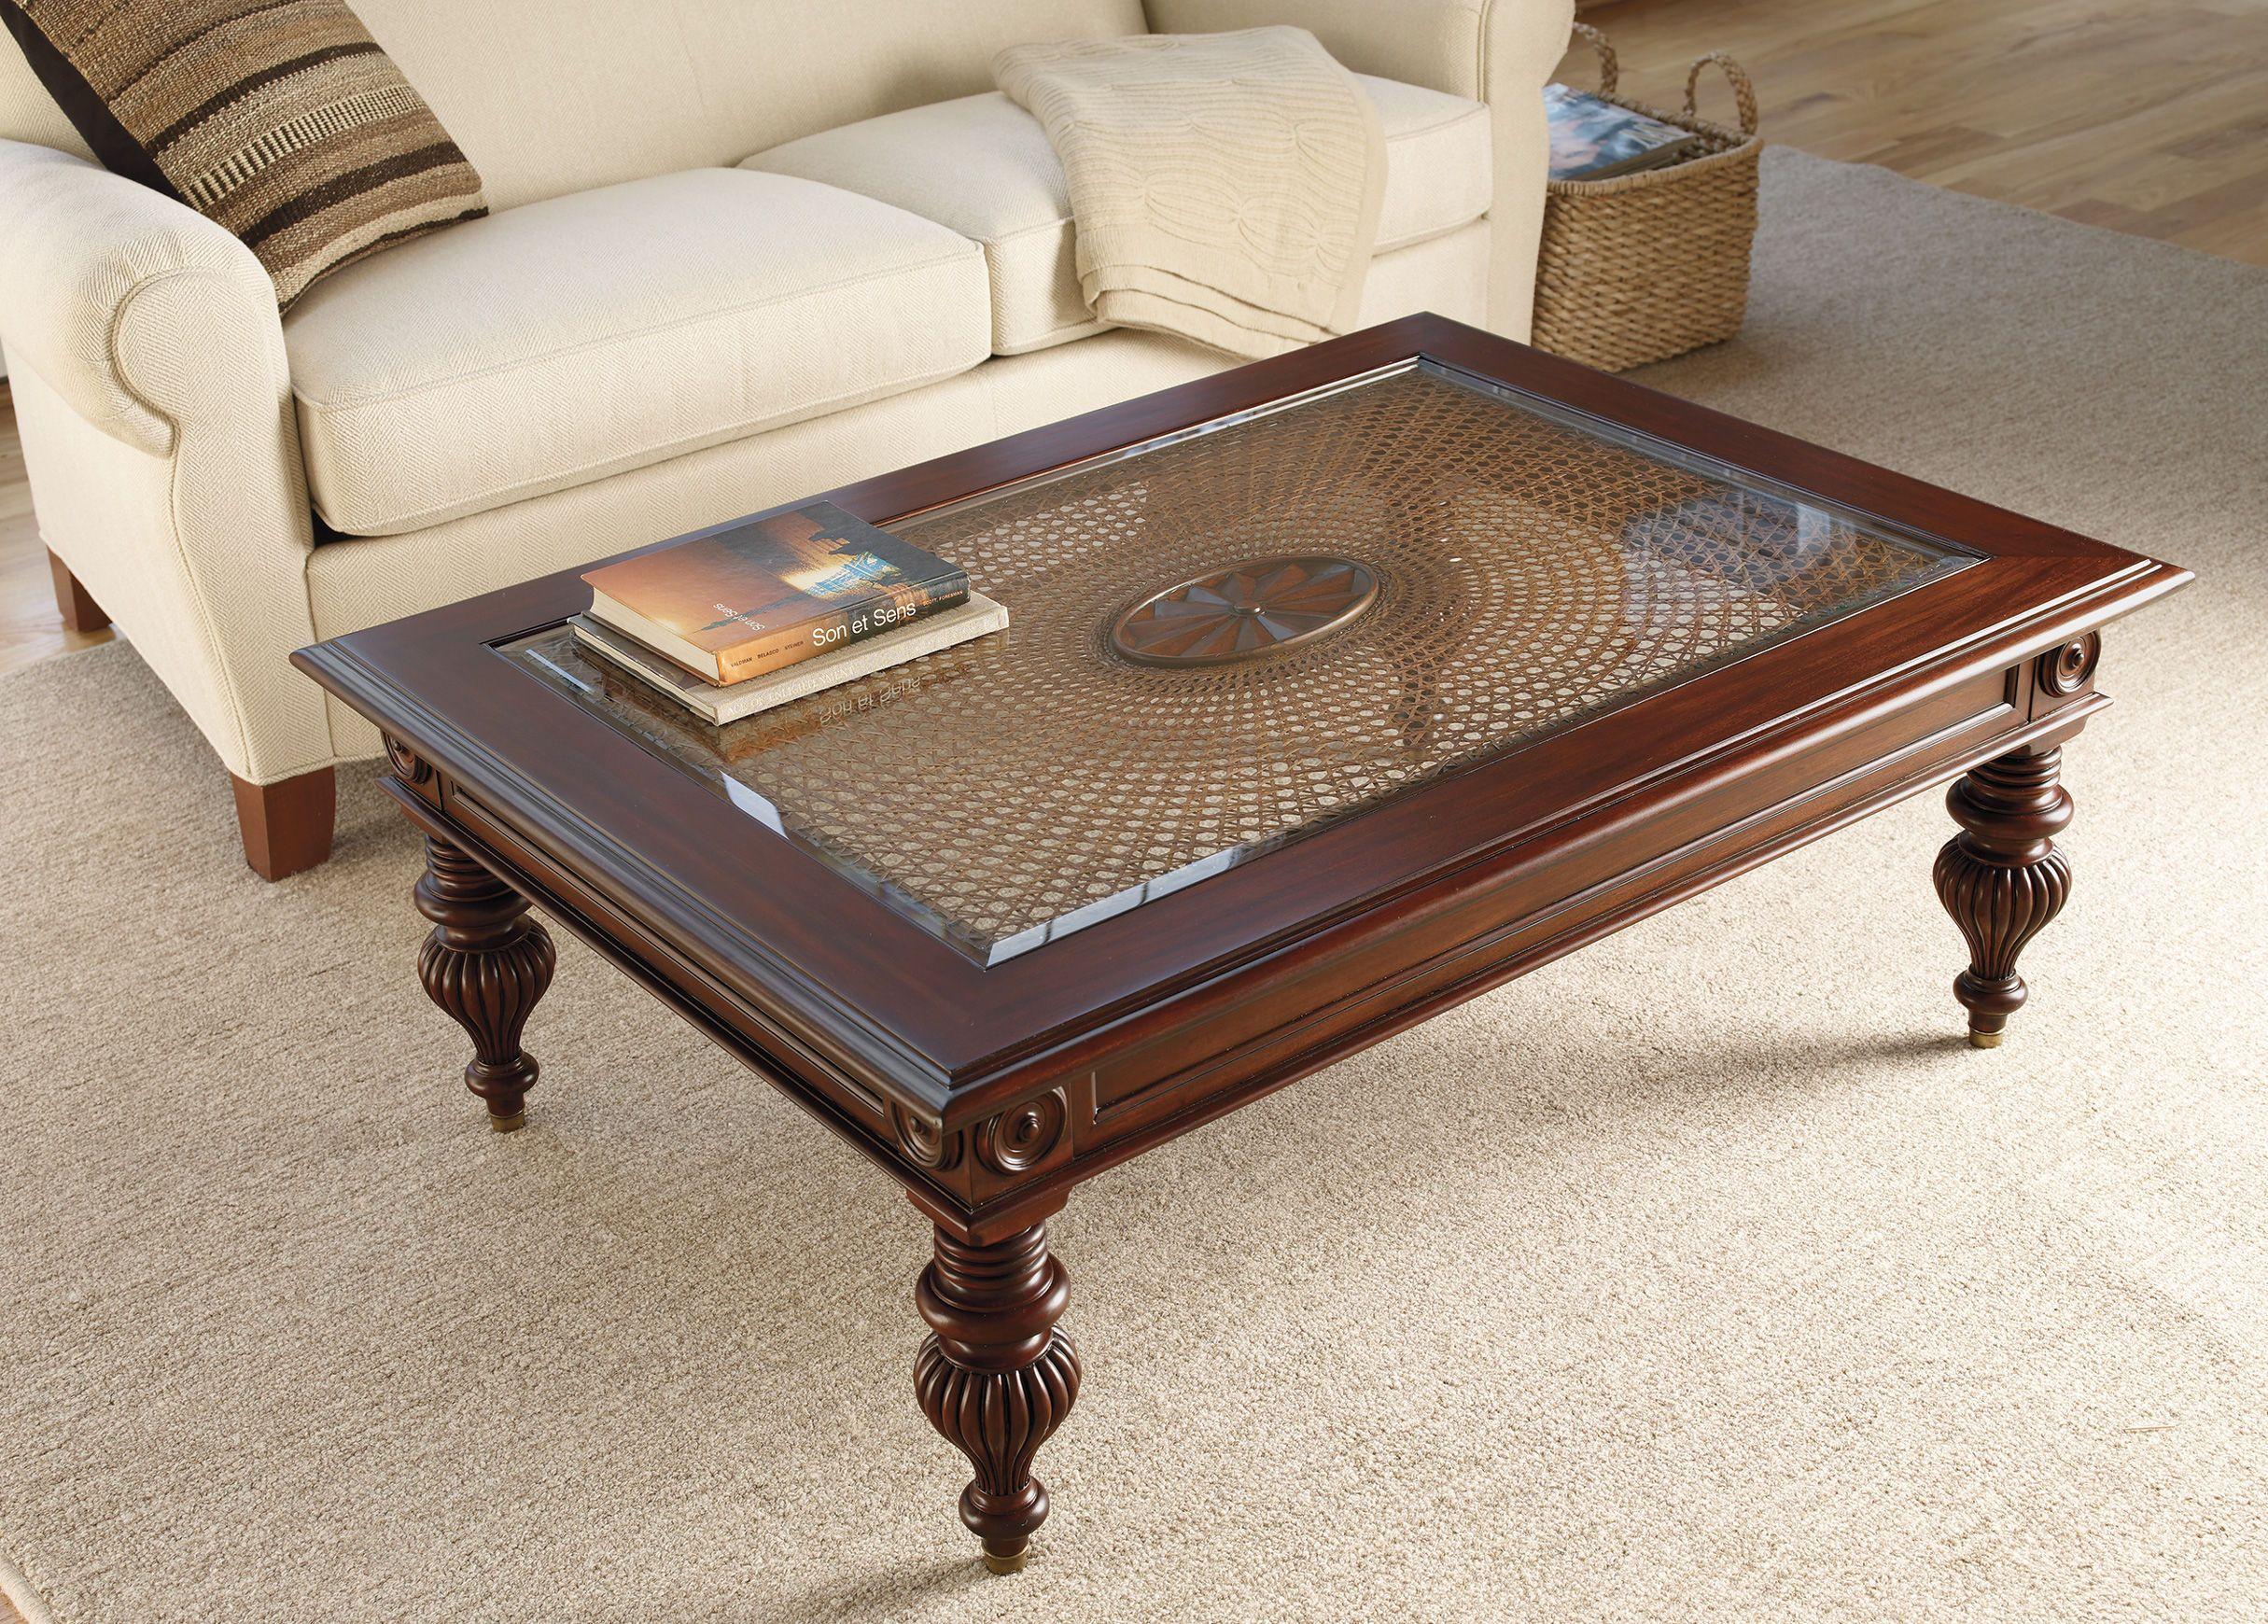 Windward Coffee Table Coffee Table Living Room Coffee Table Coffee Table Wood [ 1740 x 2430 Pixel ]